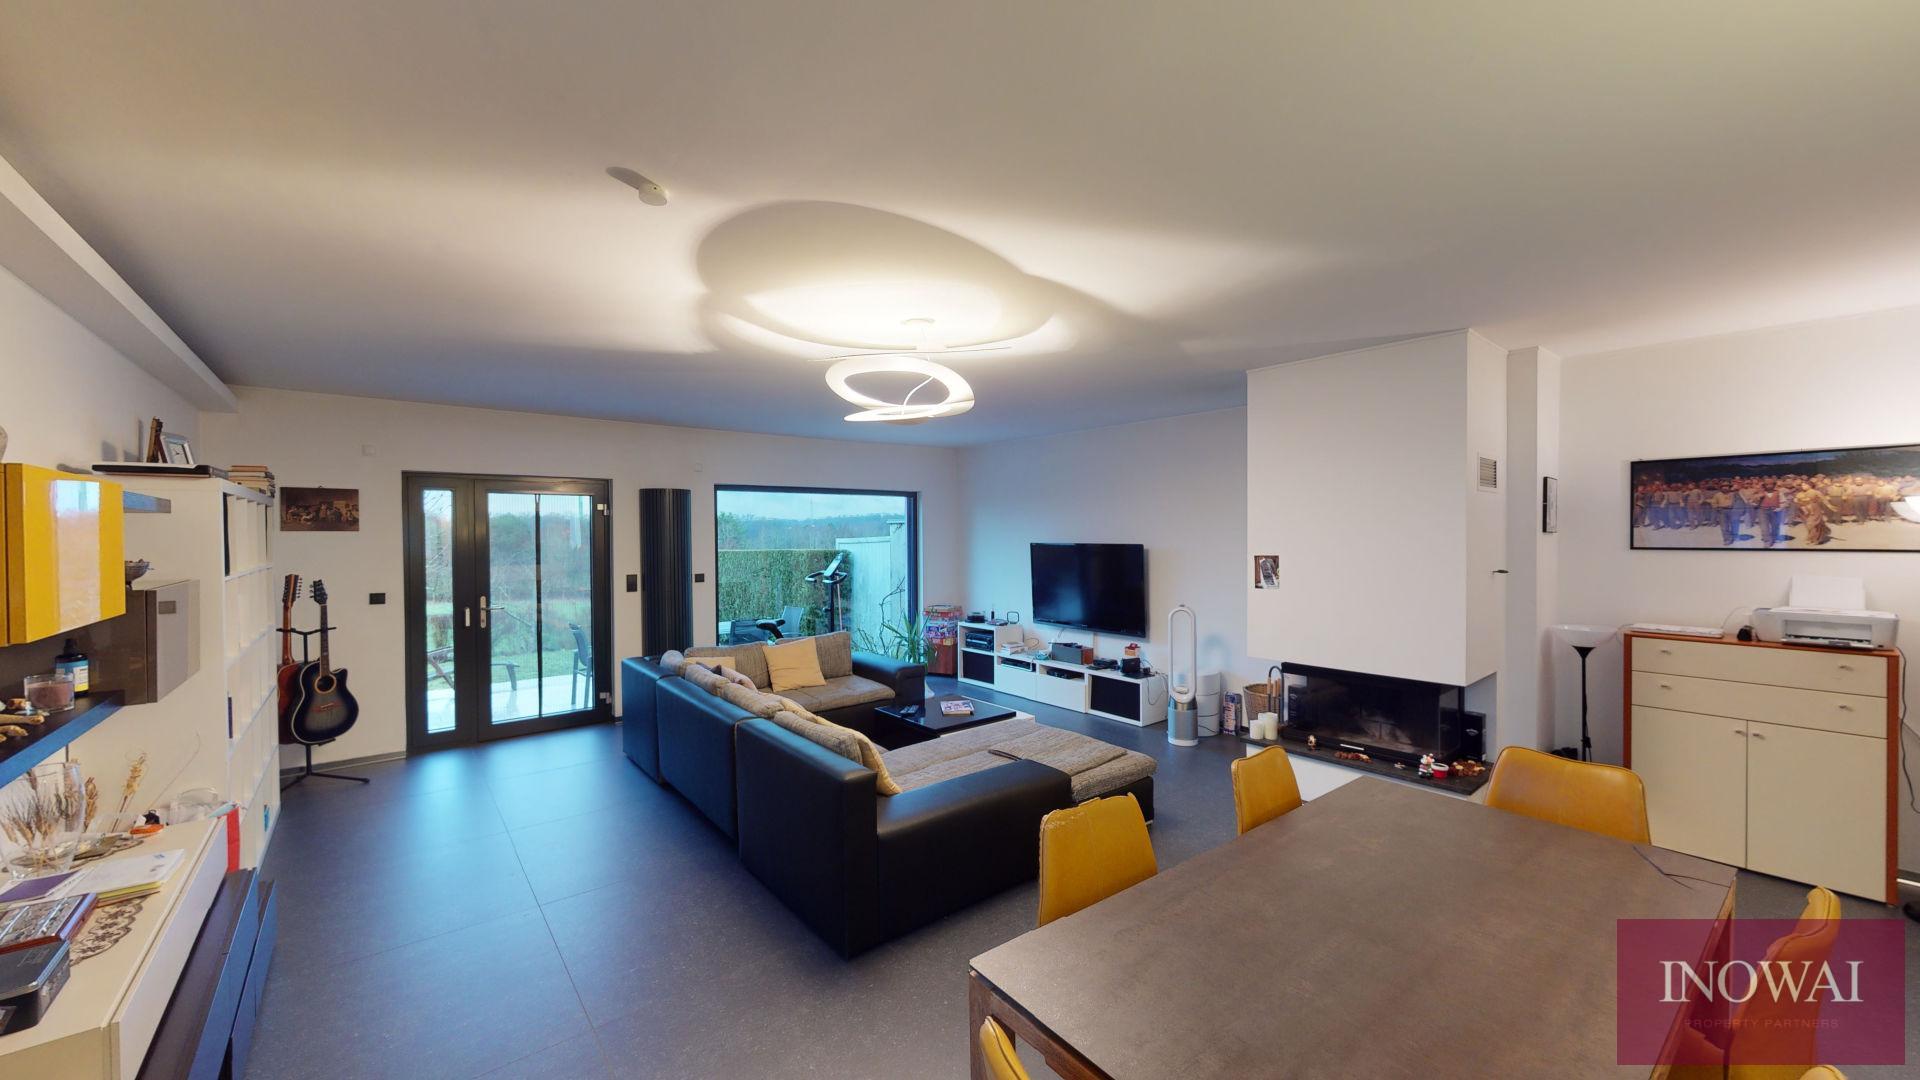 Maison meublée 3 chambres